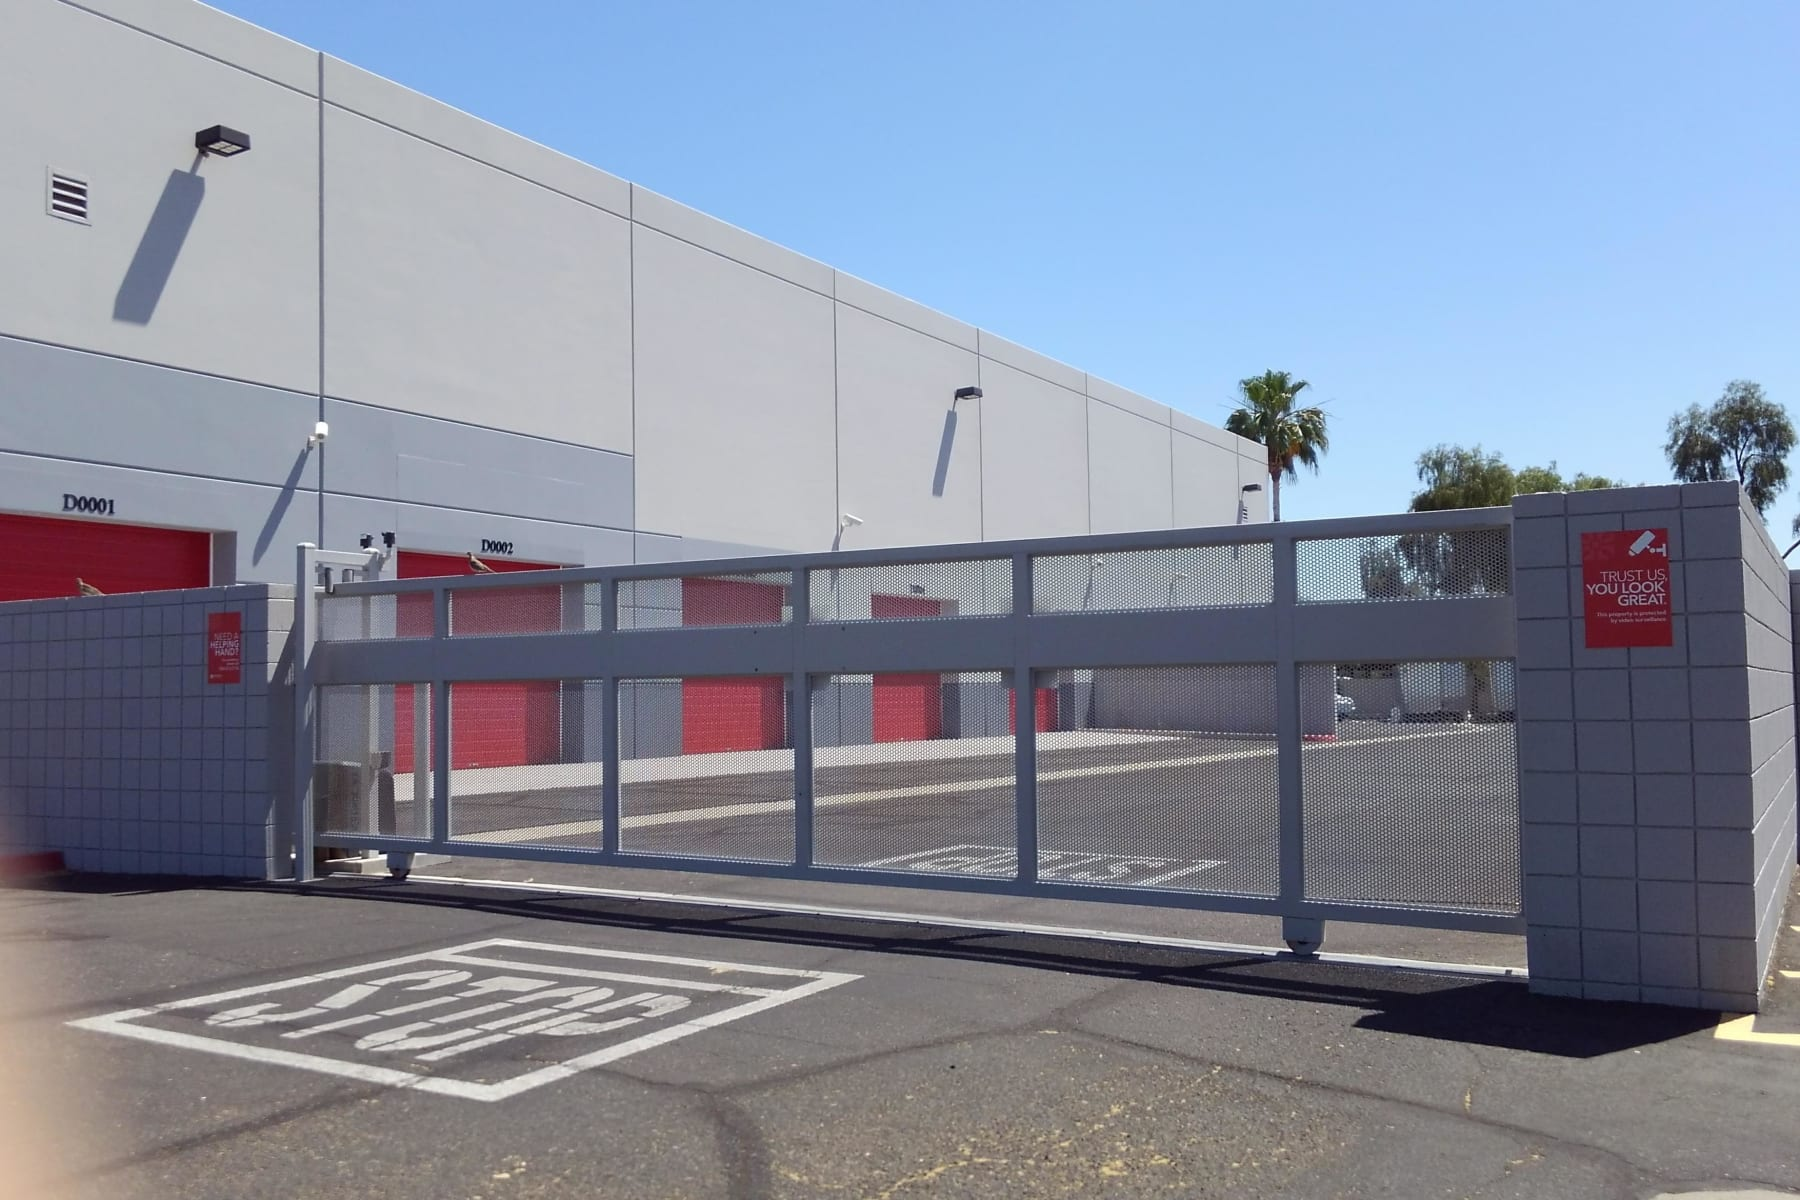 Gated entrance at StorQuest Self Storage in Chandler, AZ